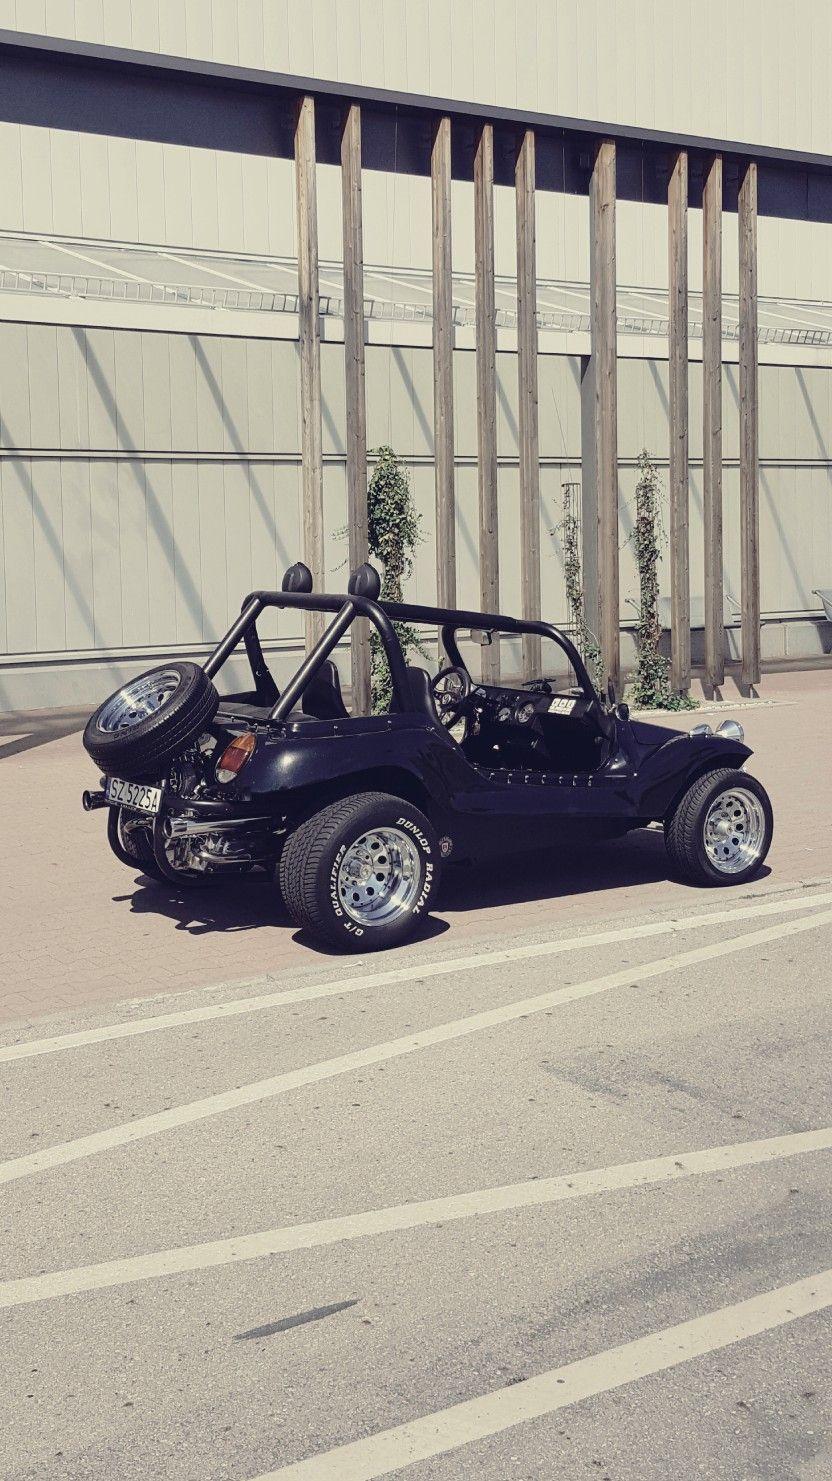 VW BUGGY 1776cc, Poland | VDUBS. Cool Rides and stuff | Pinterest